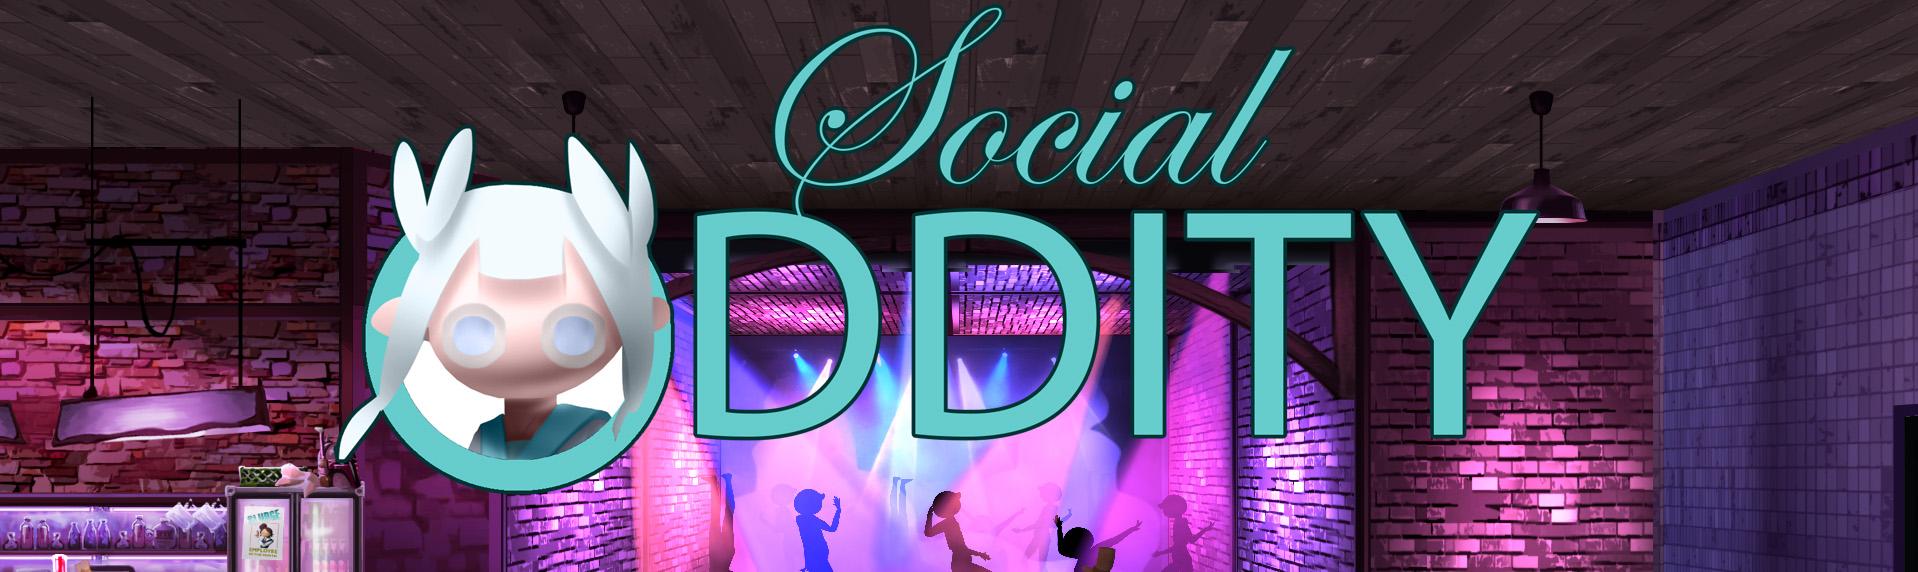 Social Oddity